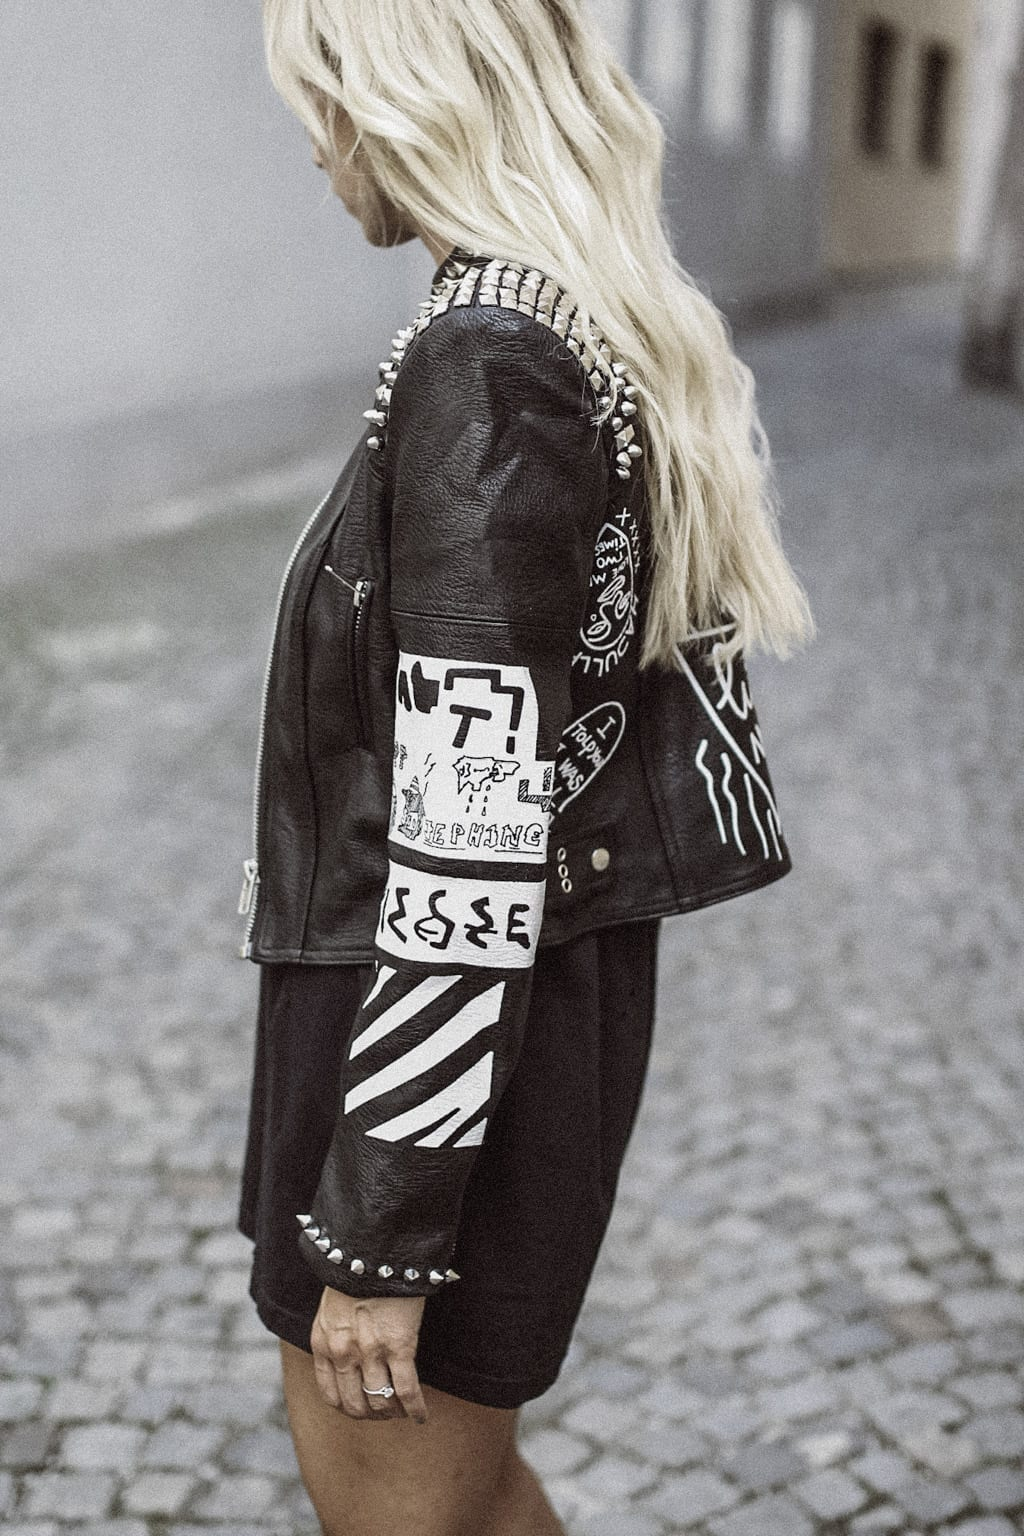 CK-1606_salzburg-fashion-street-style-look-magazine-karin-kaswurm-electric-love-2016-festival-leather-jacket-8798